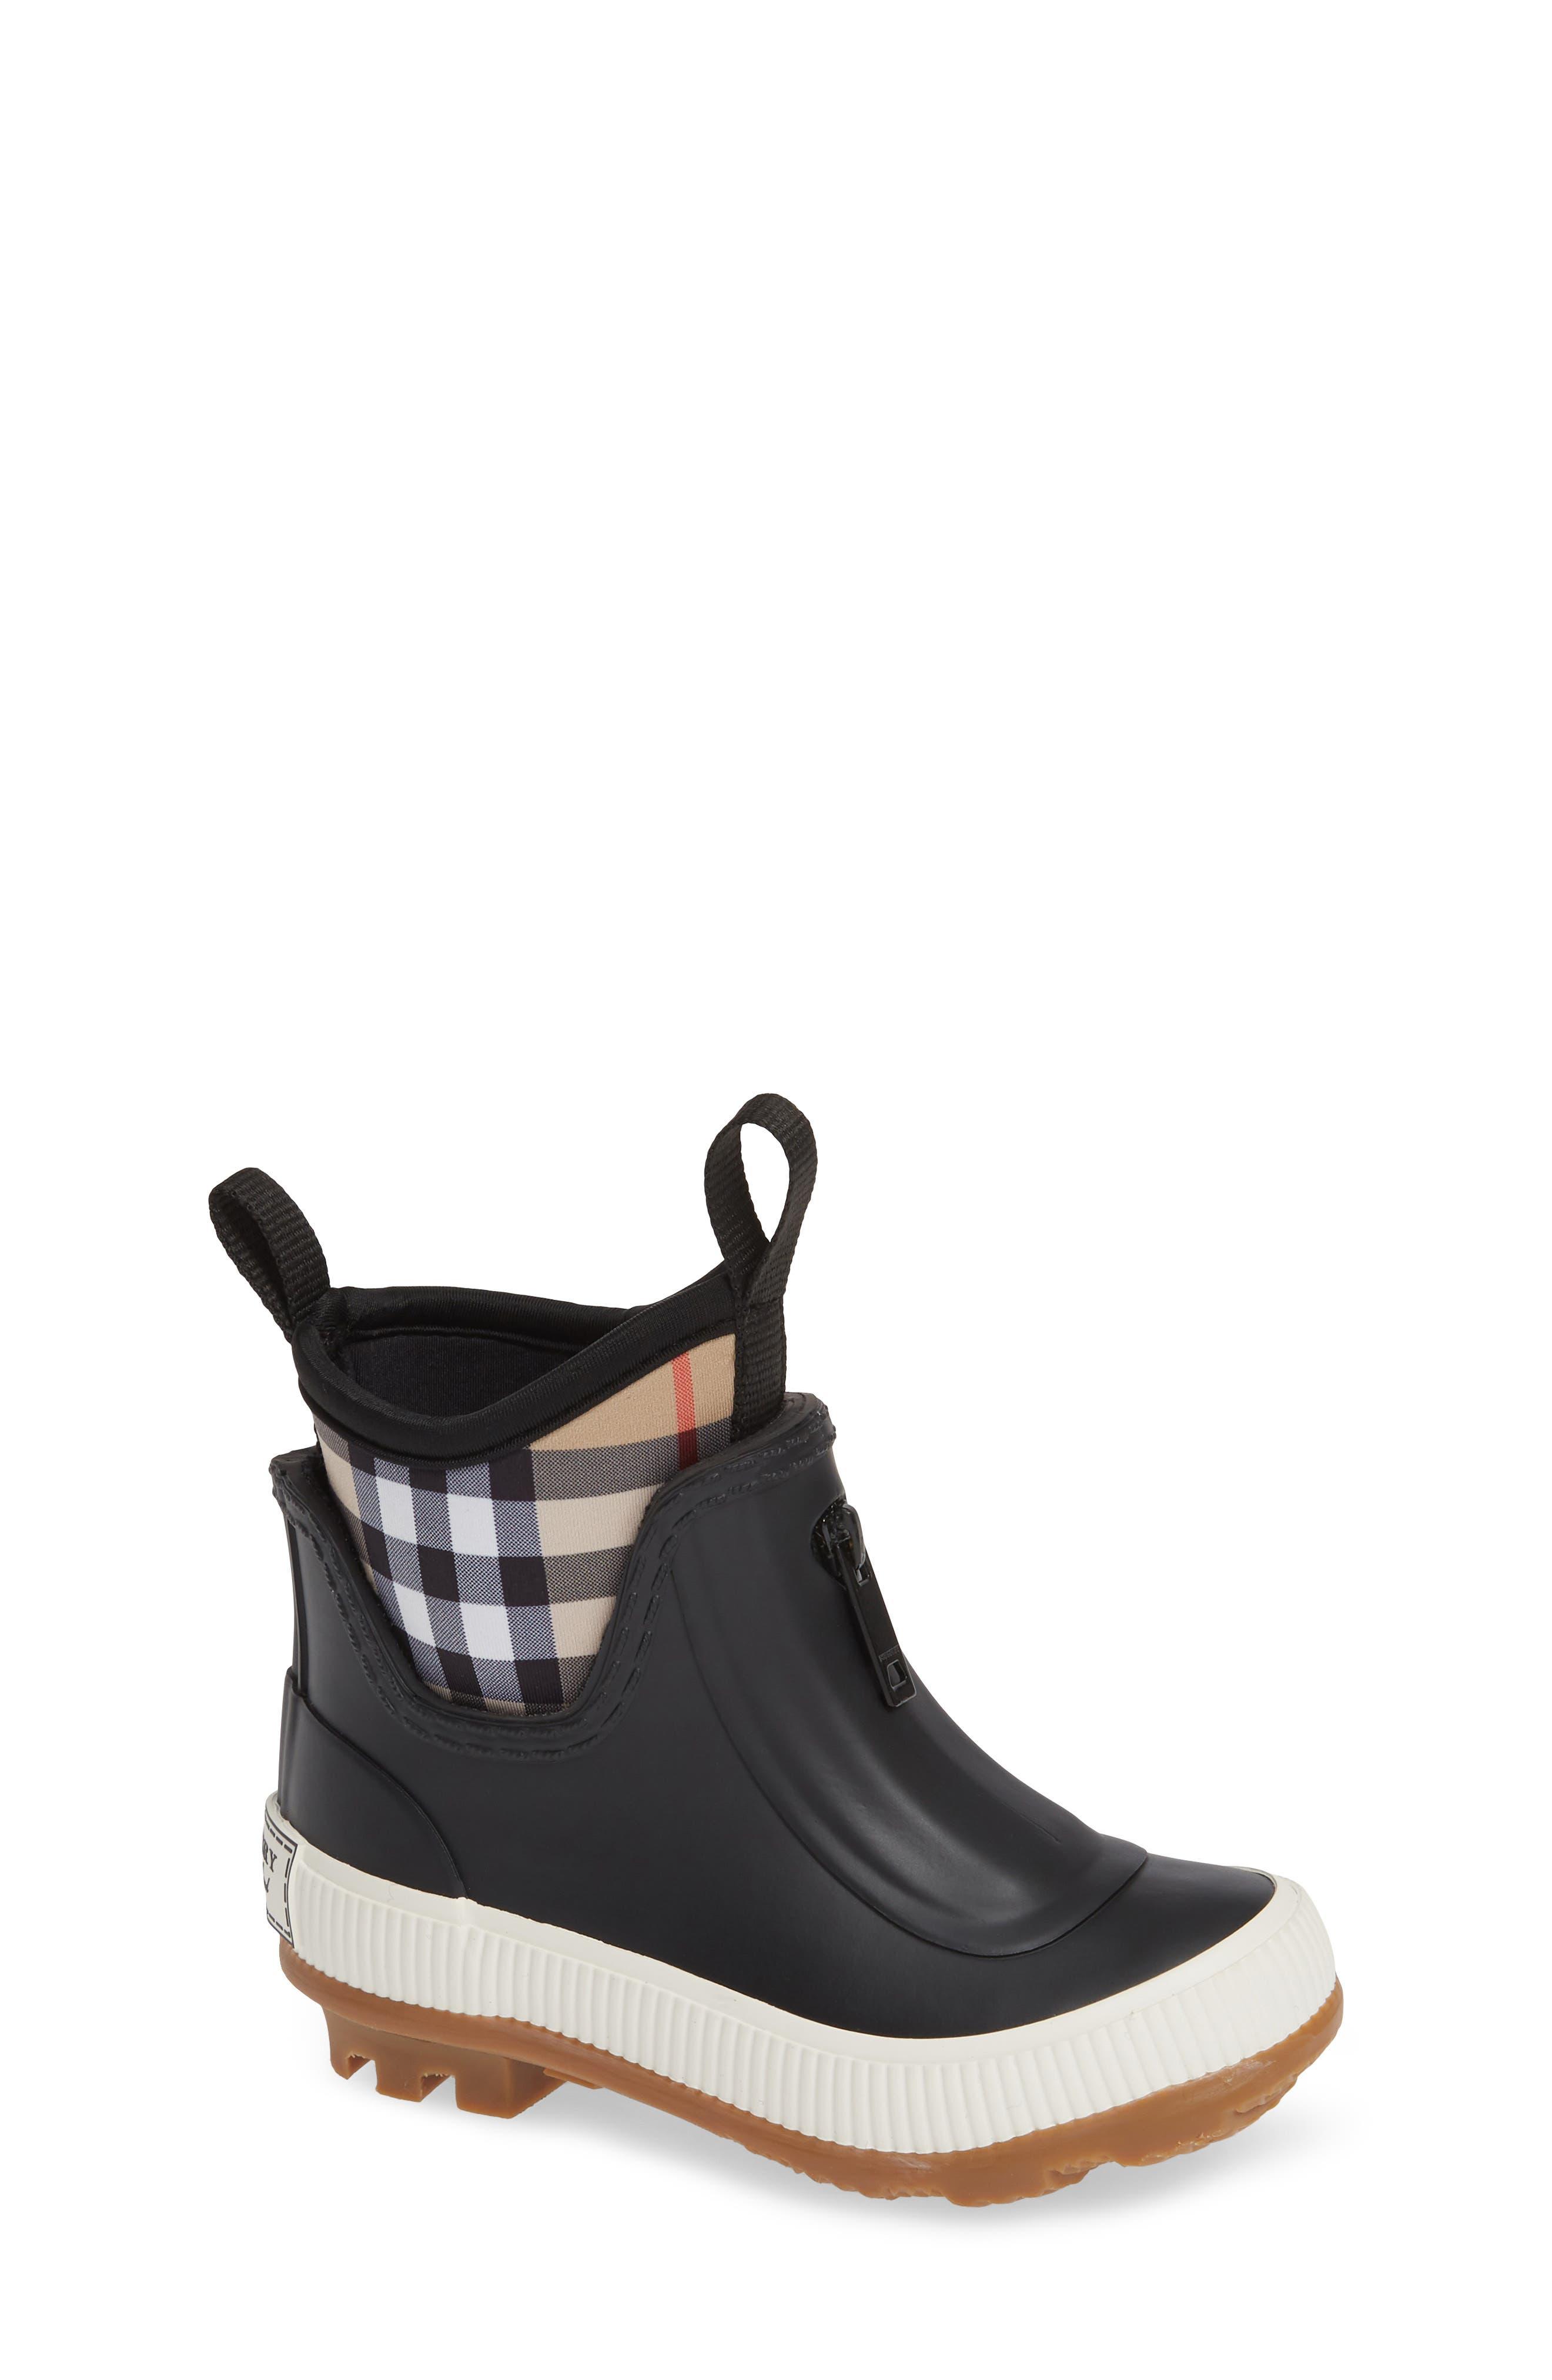 Burberry Flinton Waterproof Rain Boot